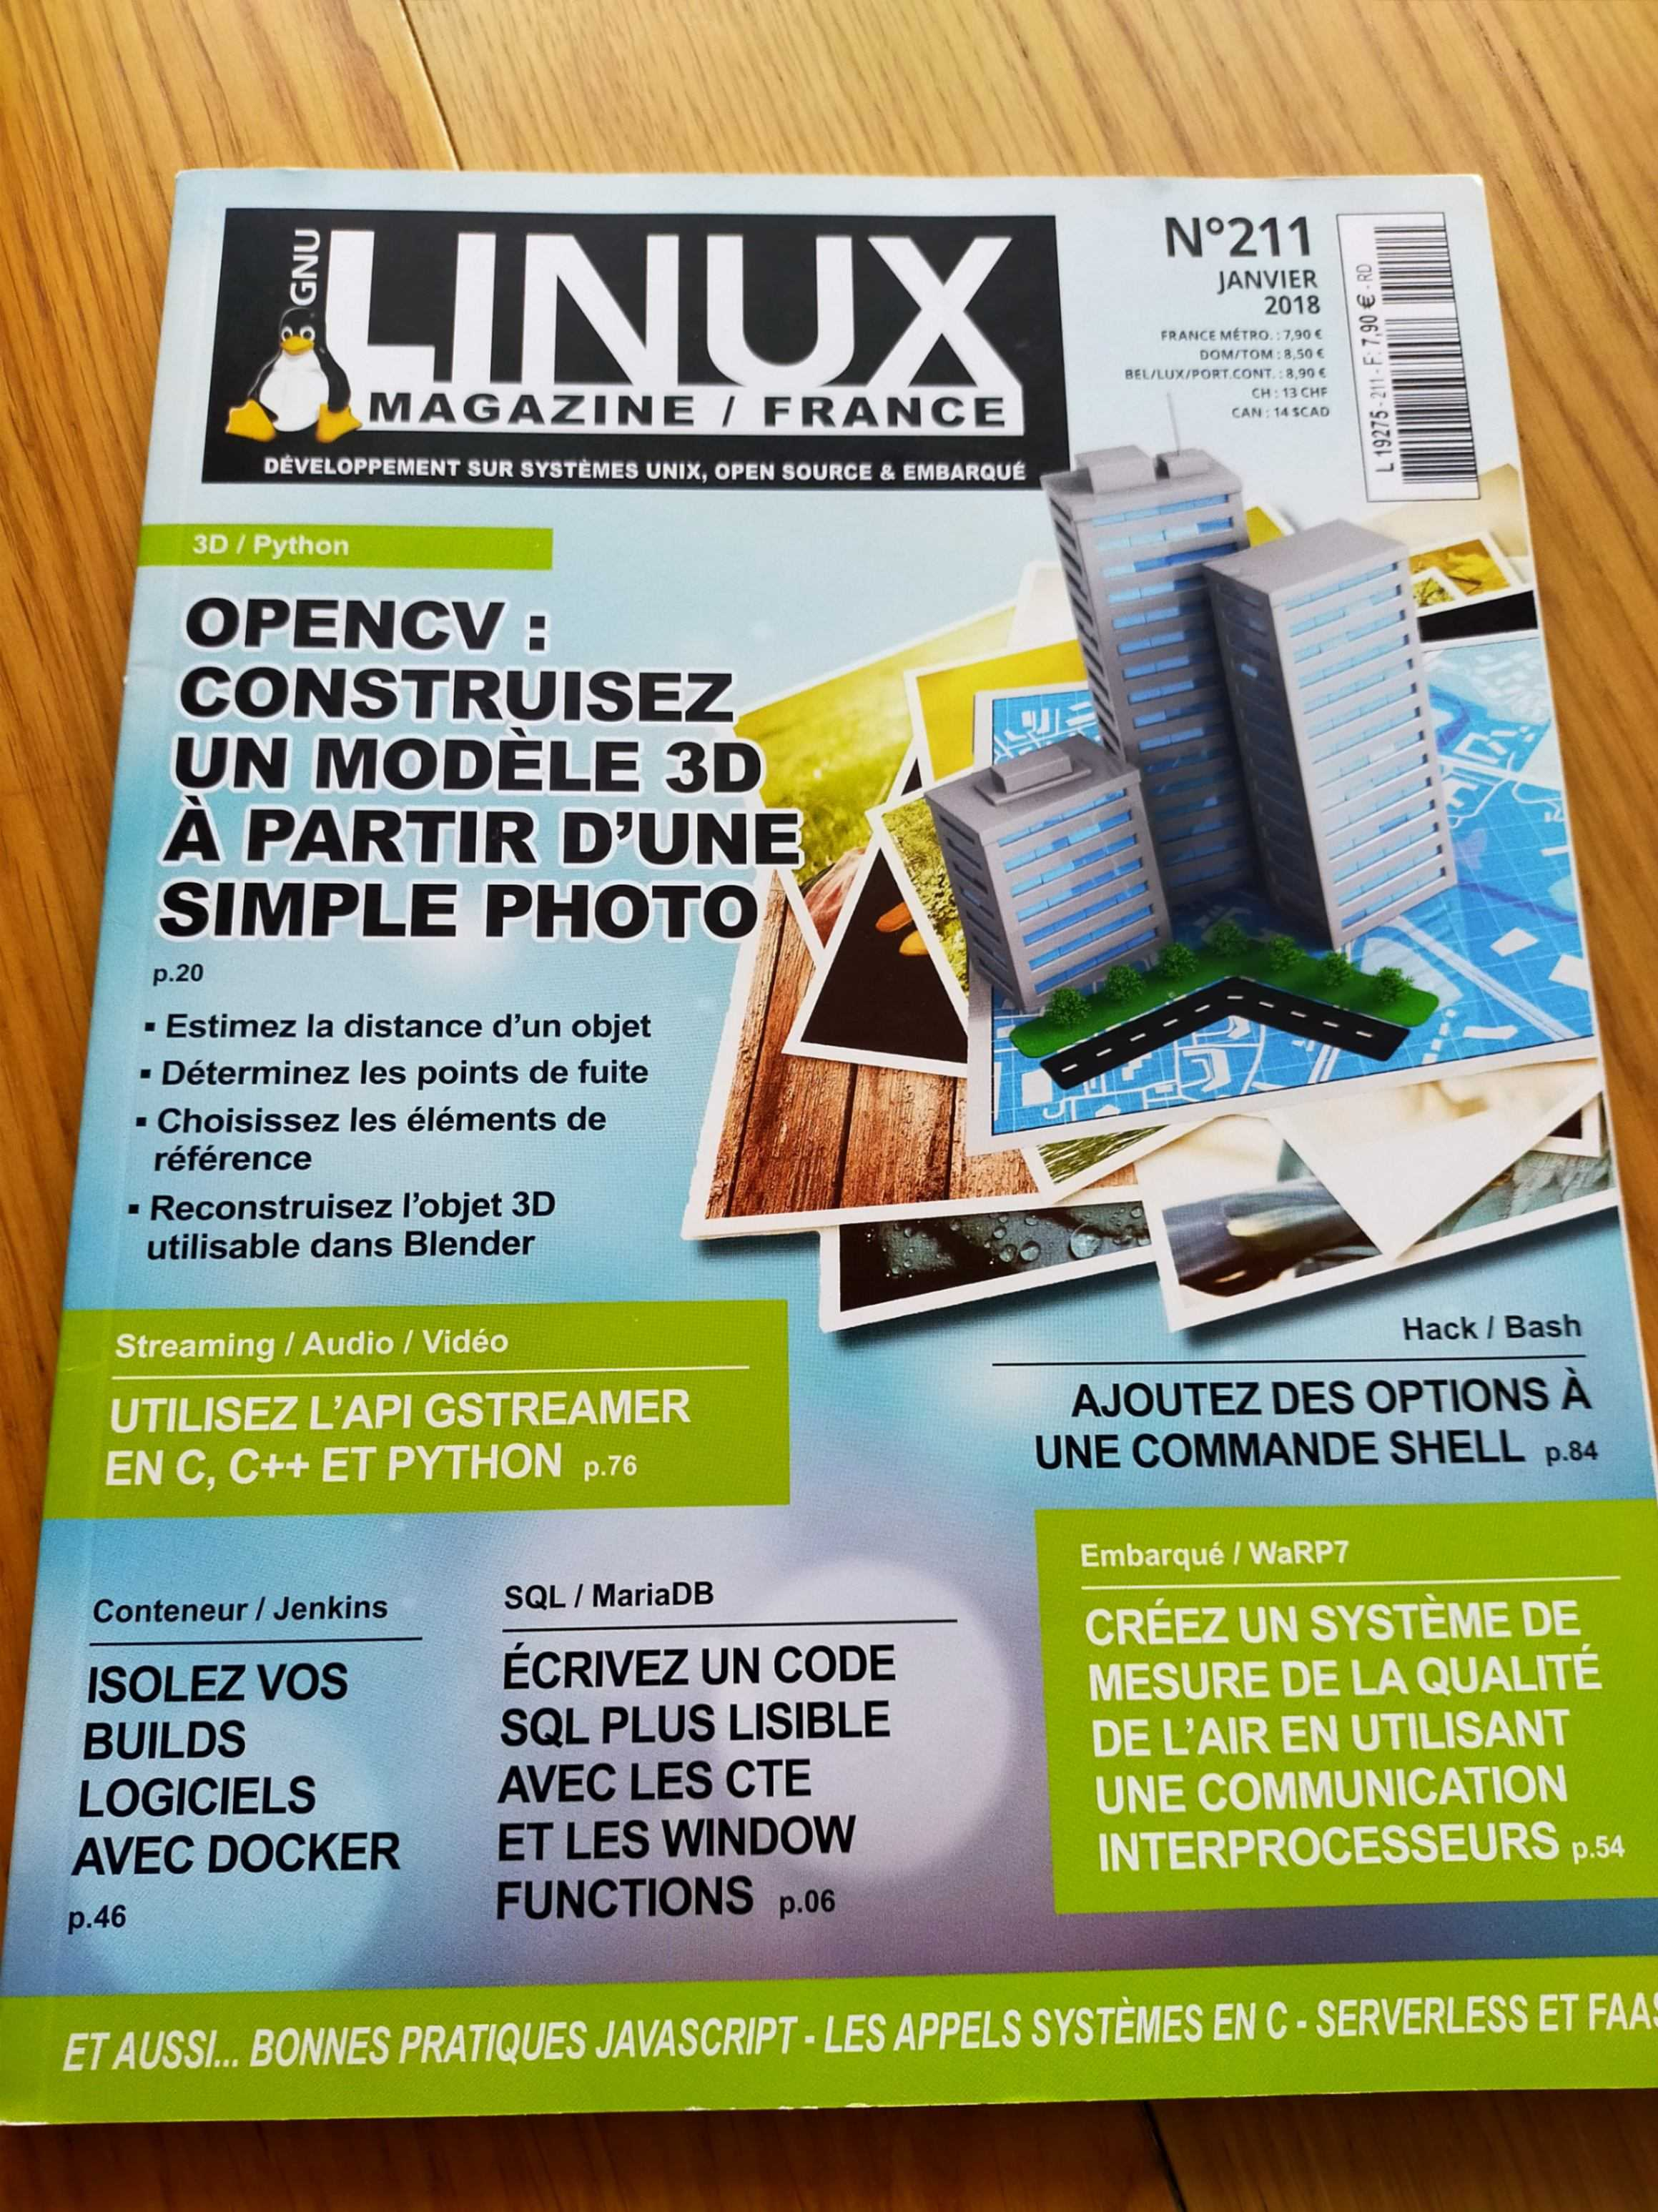 https://luxexpats.fra1.cdn.digitaloceanspaces.com/original_0_1627815756926_E9SU8bu4pe5pcv6j.jpeg